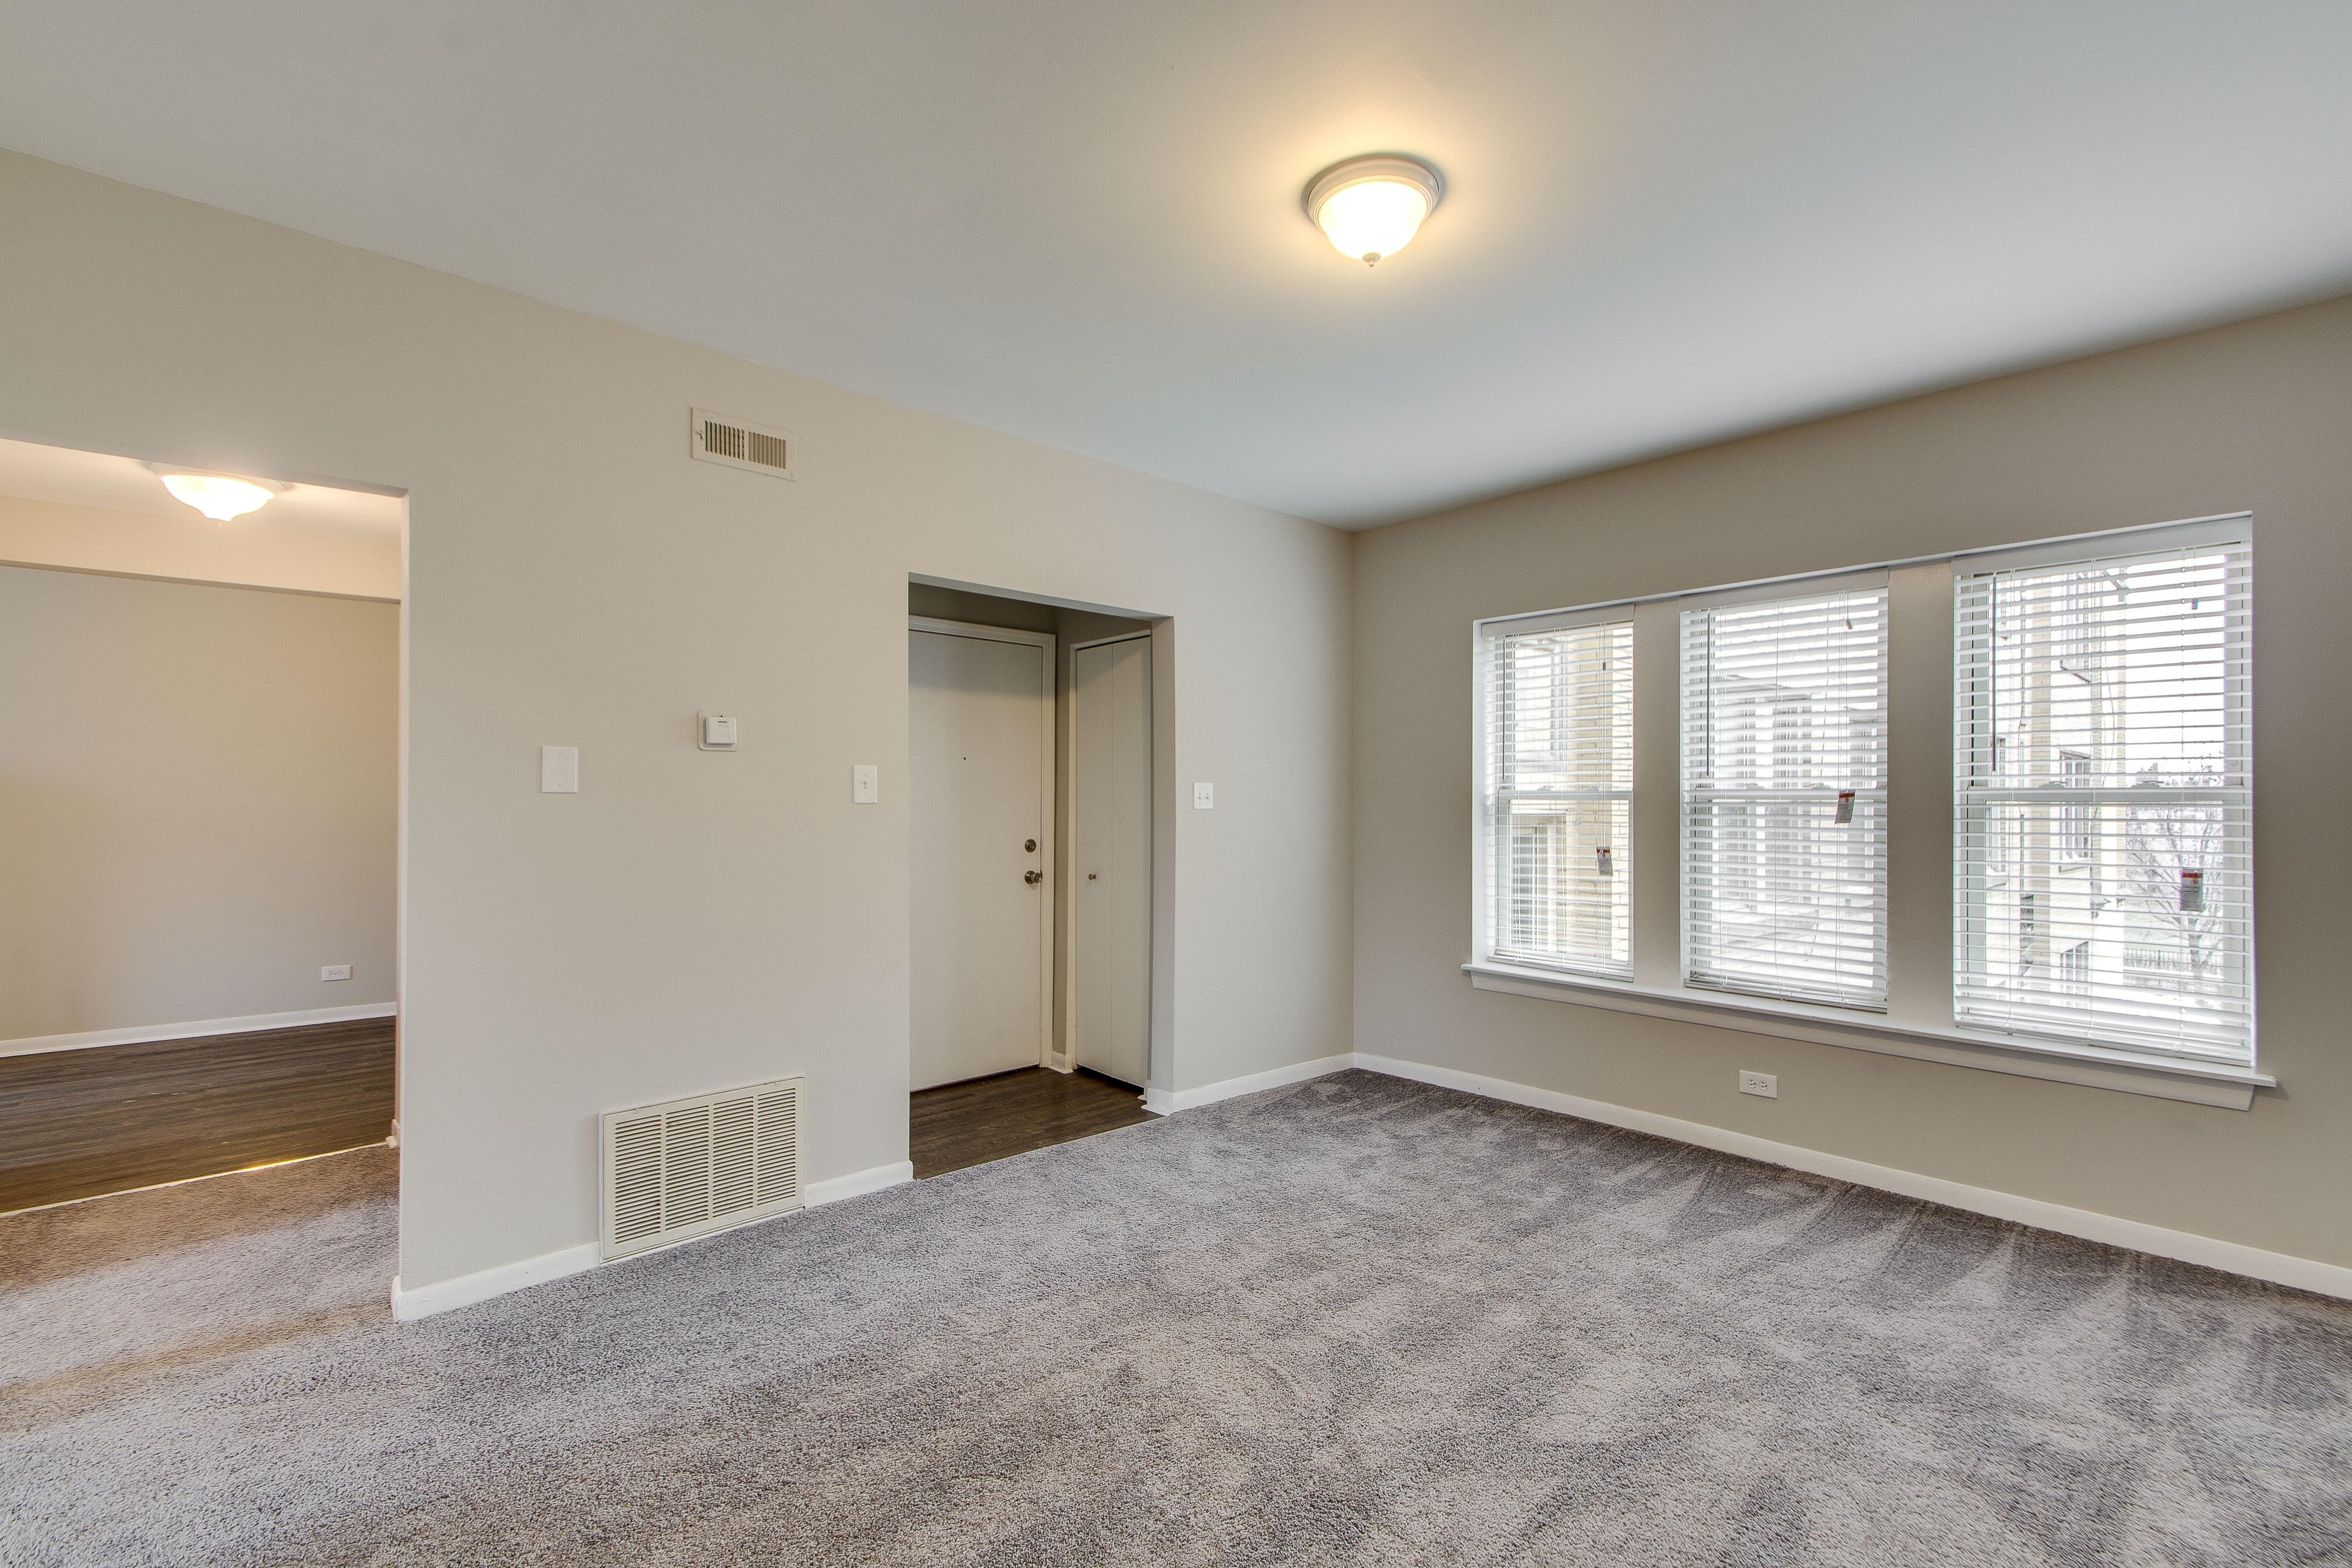 2406 North Kilbourn Avenue Chicago Il 60639 1 Bedroom Apartment For Rent Padmapper